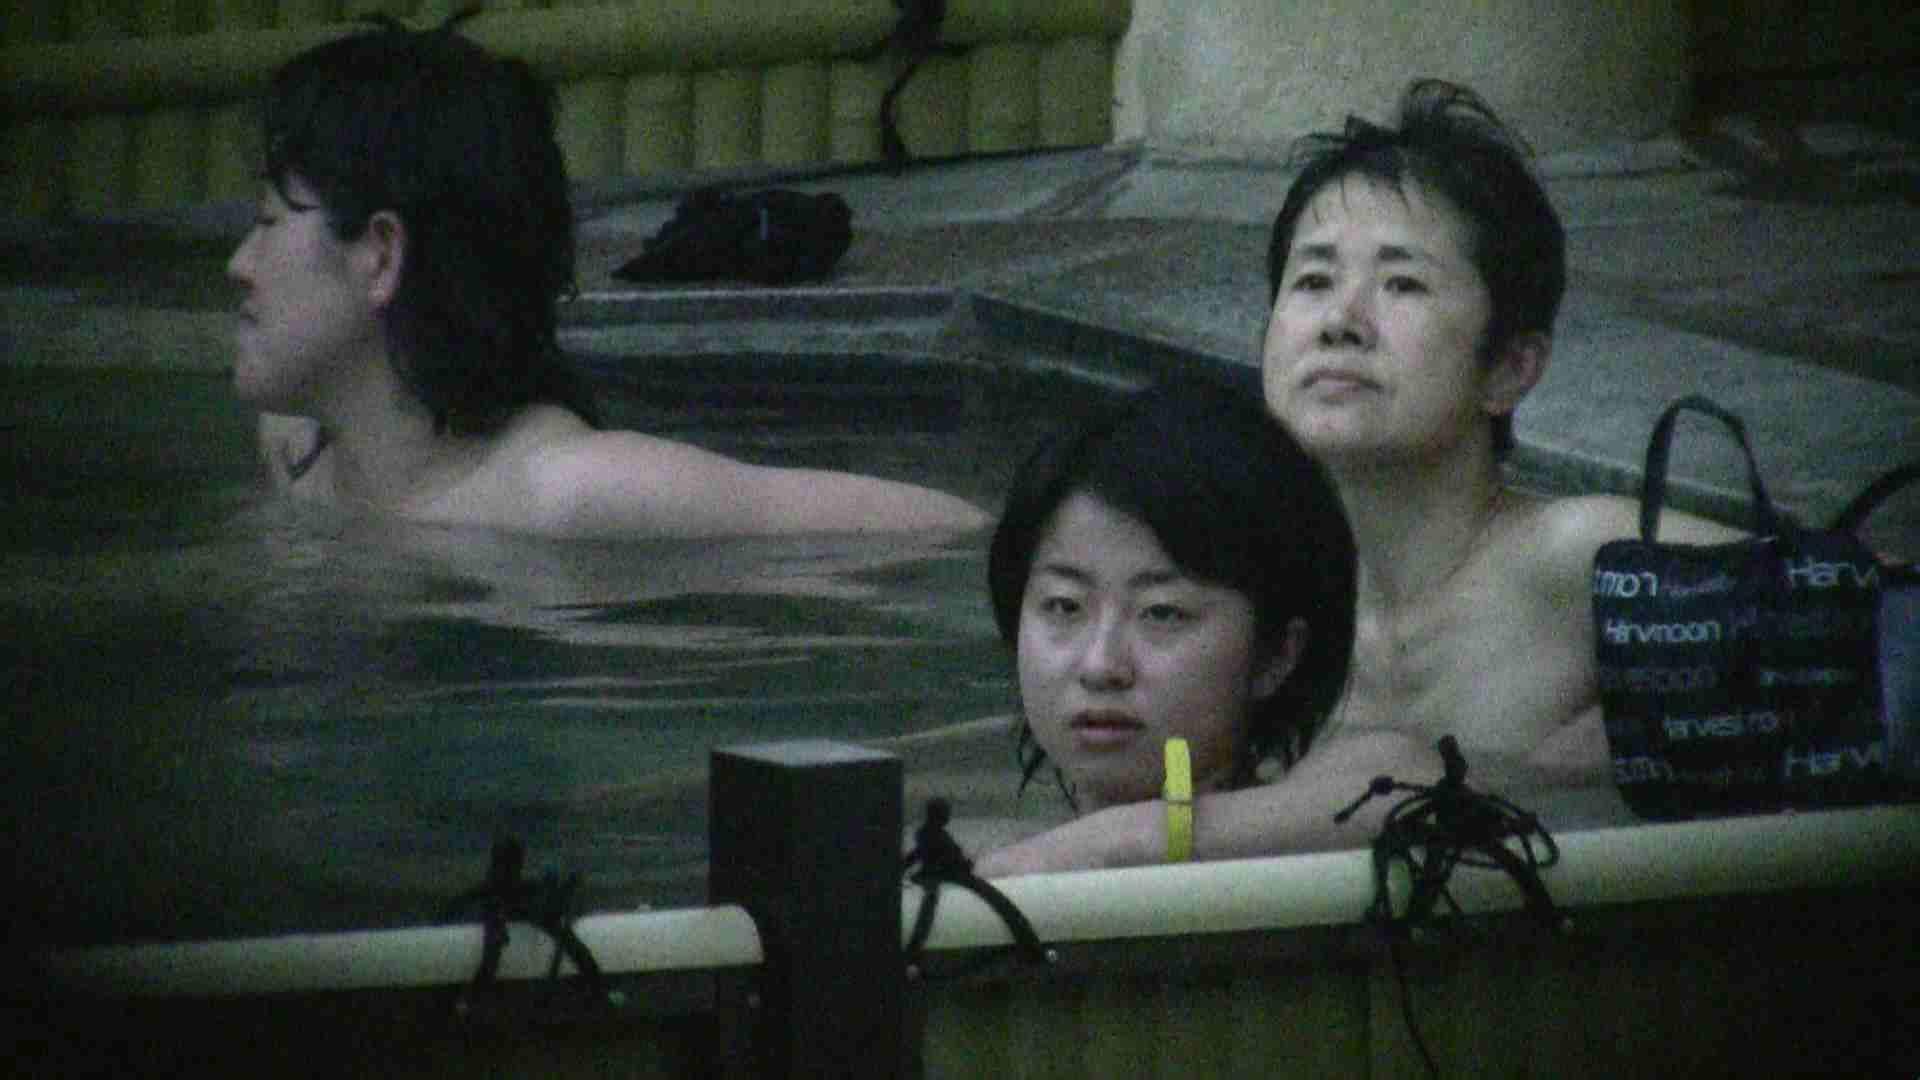 Aquaな露天風呂Vol.112 盗撮シリーズ   露天風呂編  93PIX 27